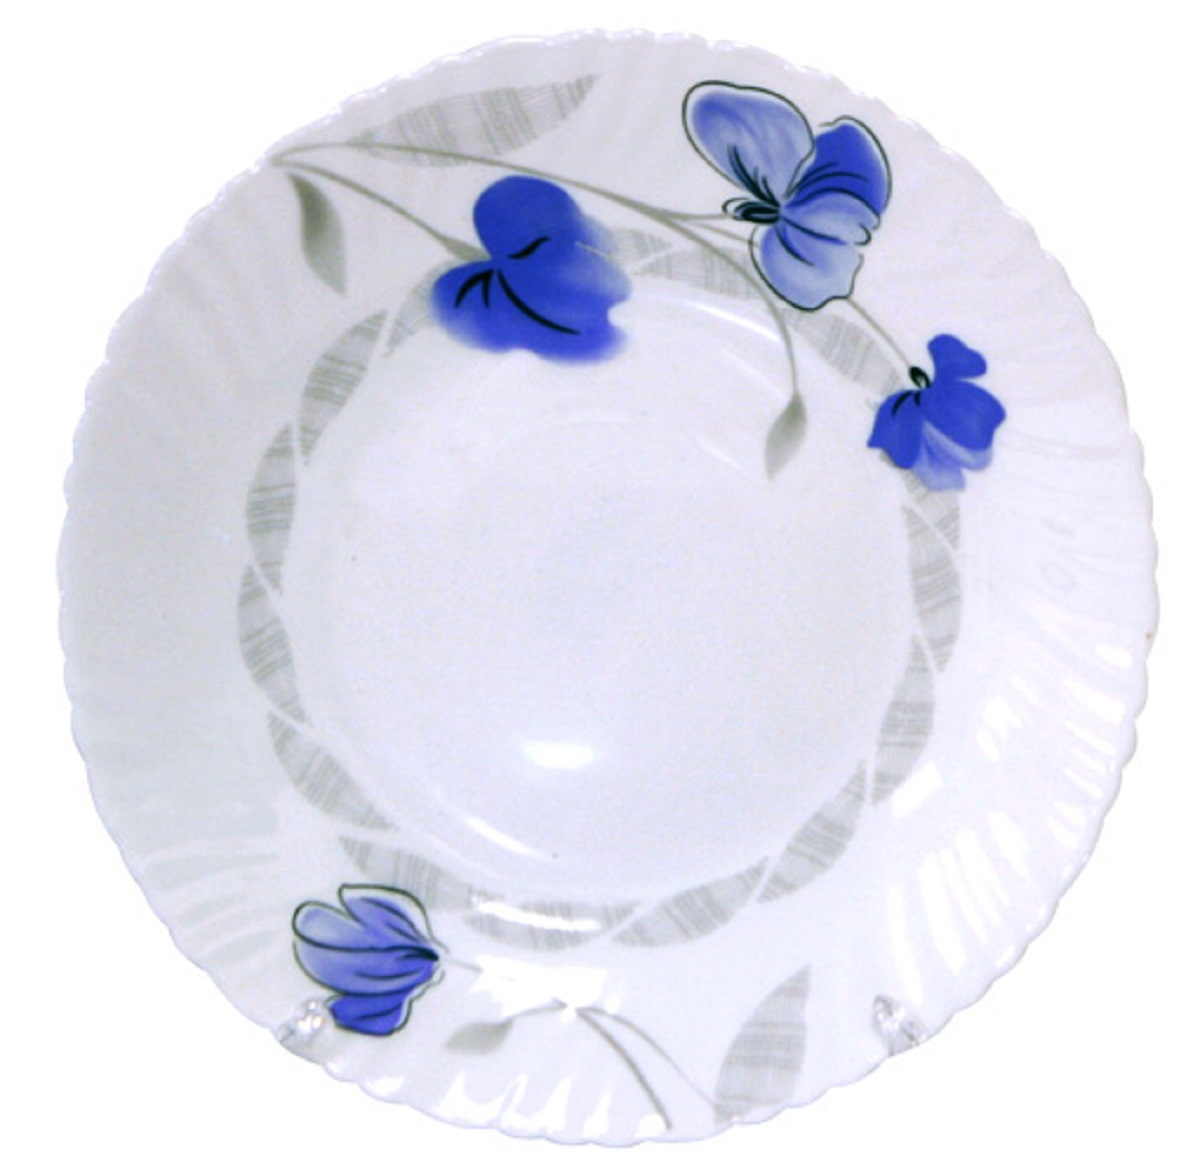 Тарелка обеденная Chinbull Нанси, диаметр 24 см тарелка обеденная 24 см miolla тарелка обеденная 24 см